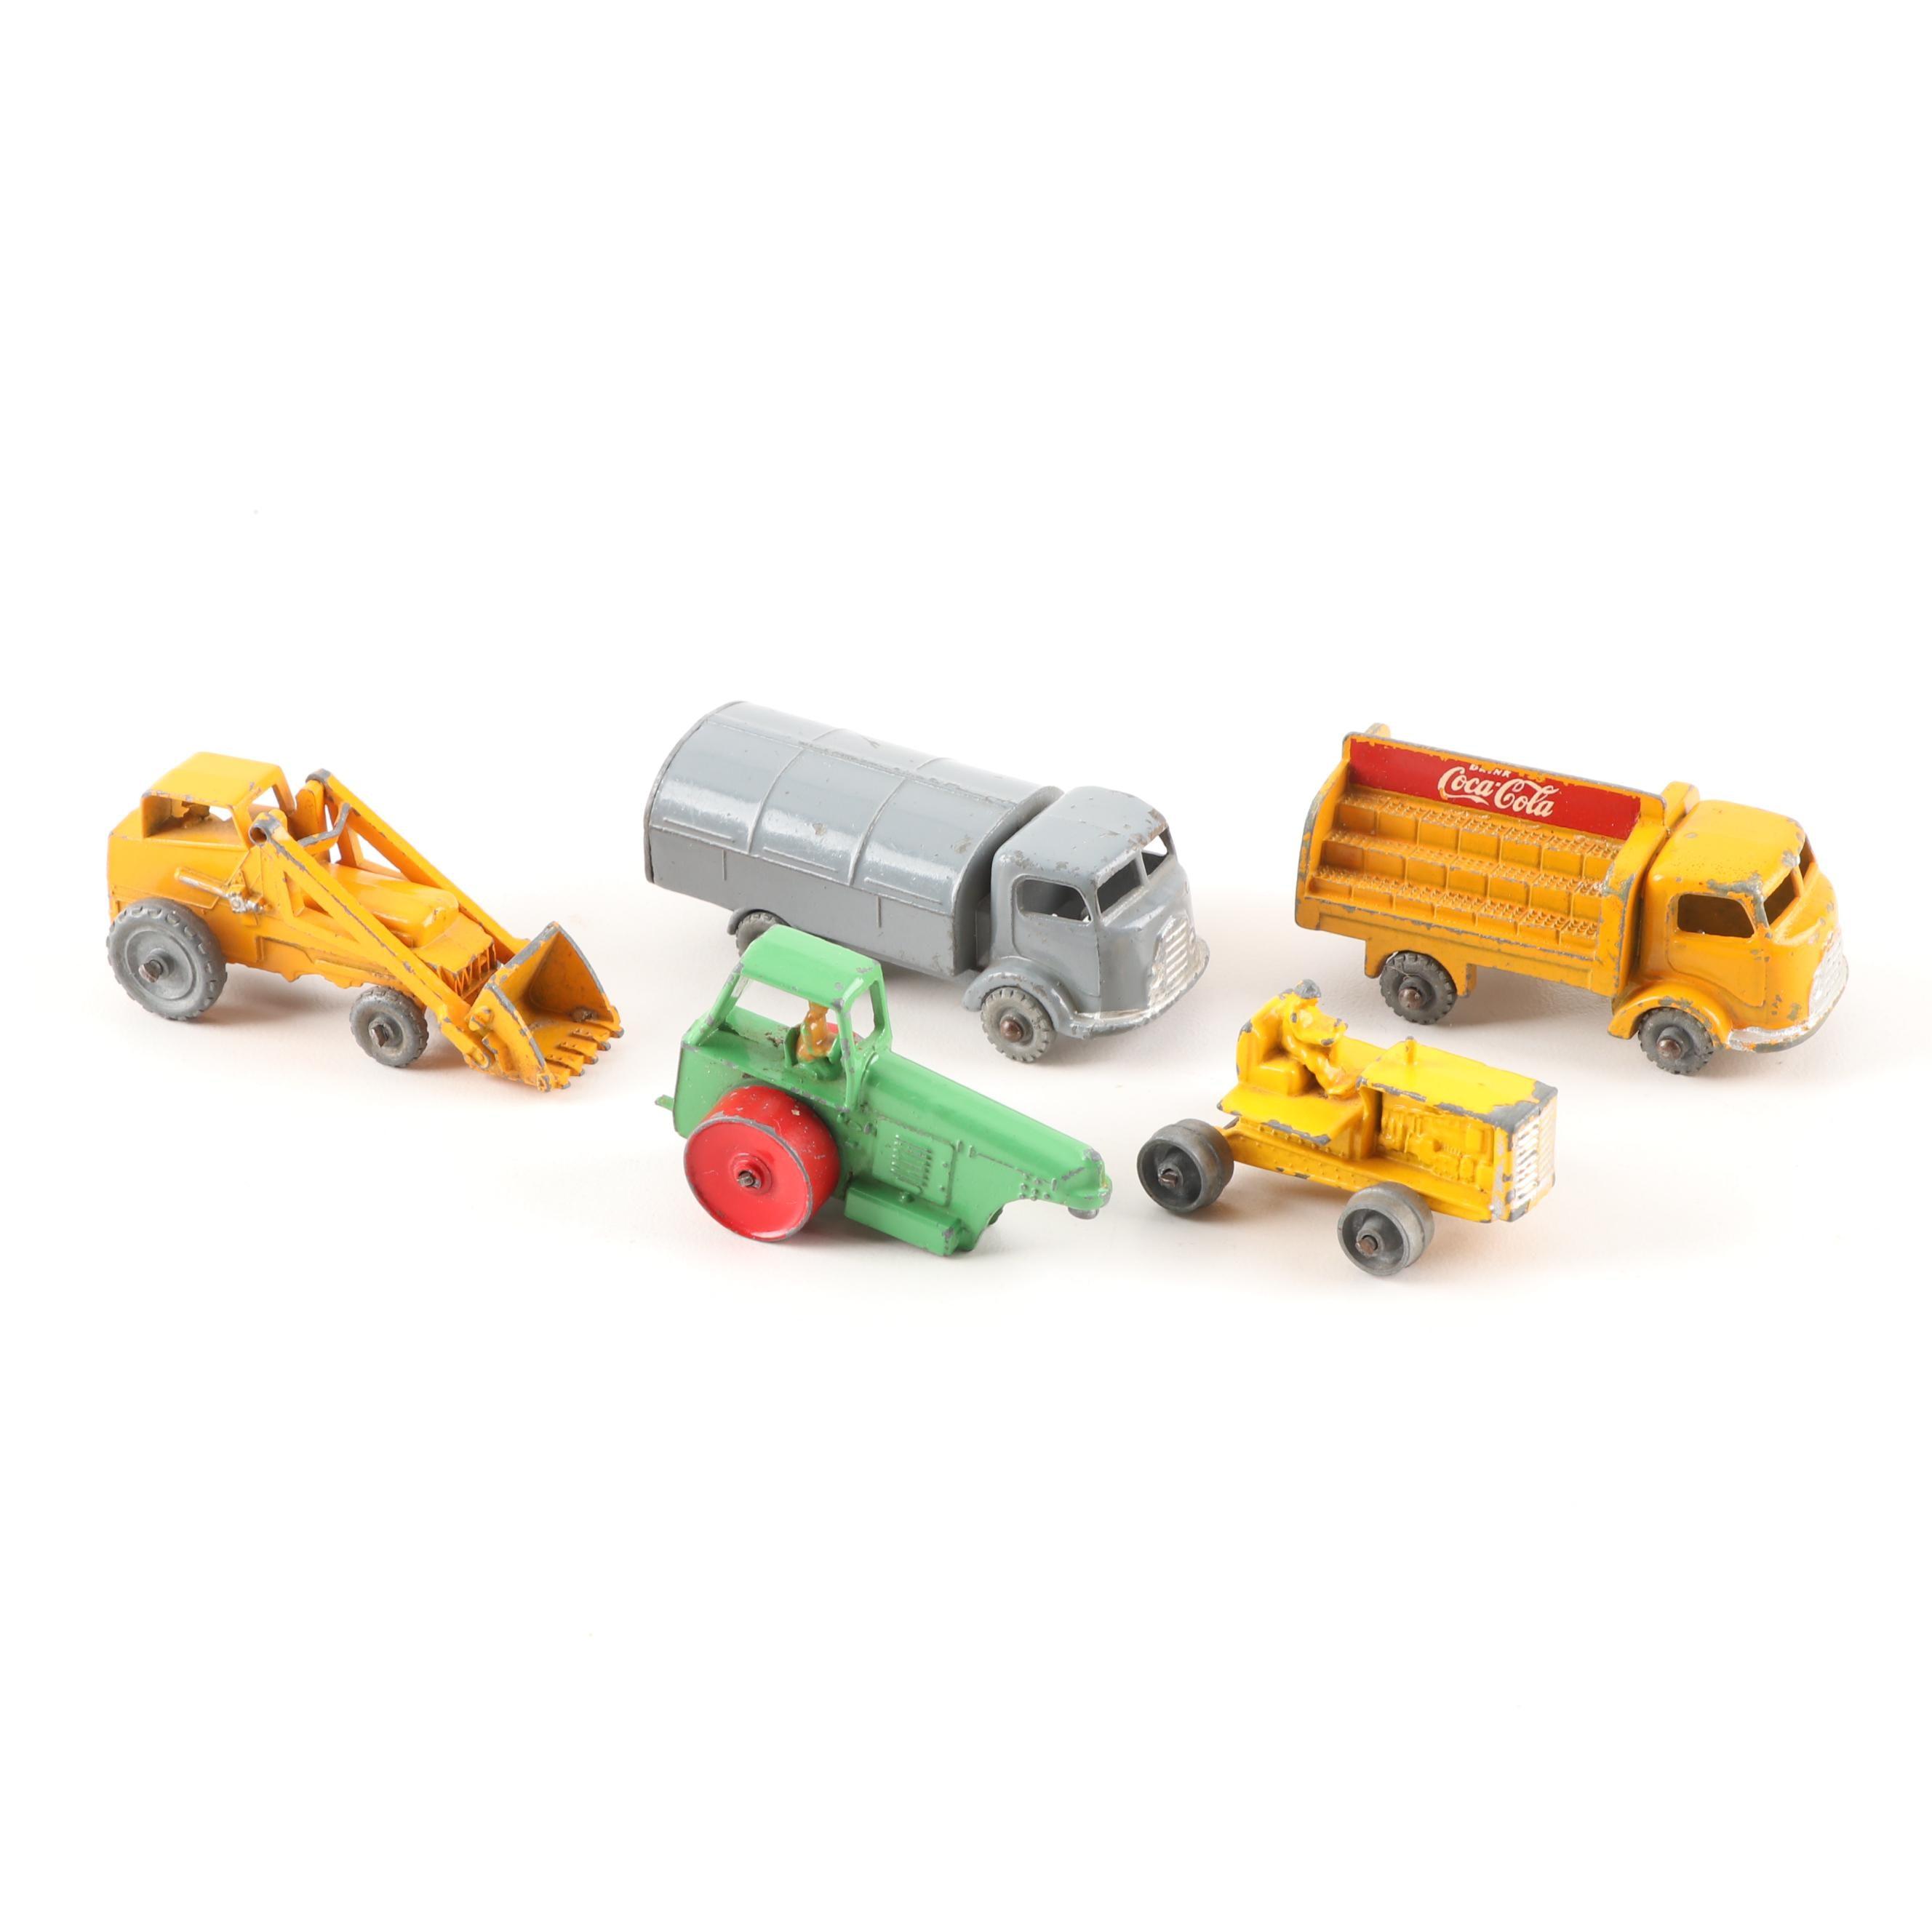 Vintage Lesney English-Made Die Cast Trucks